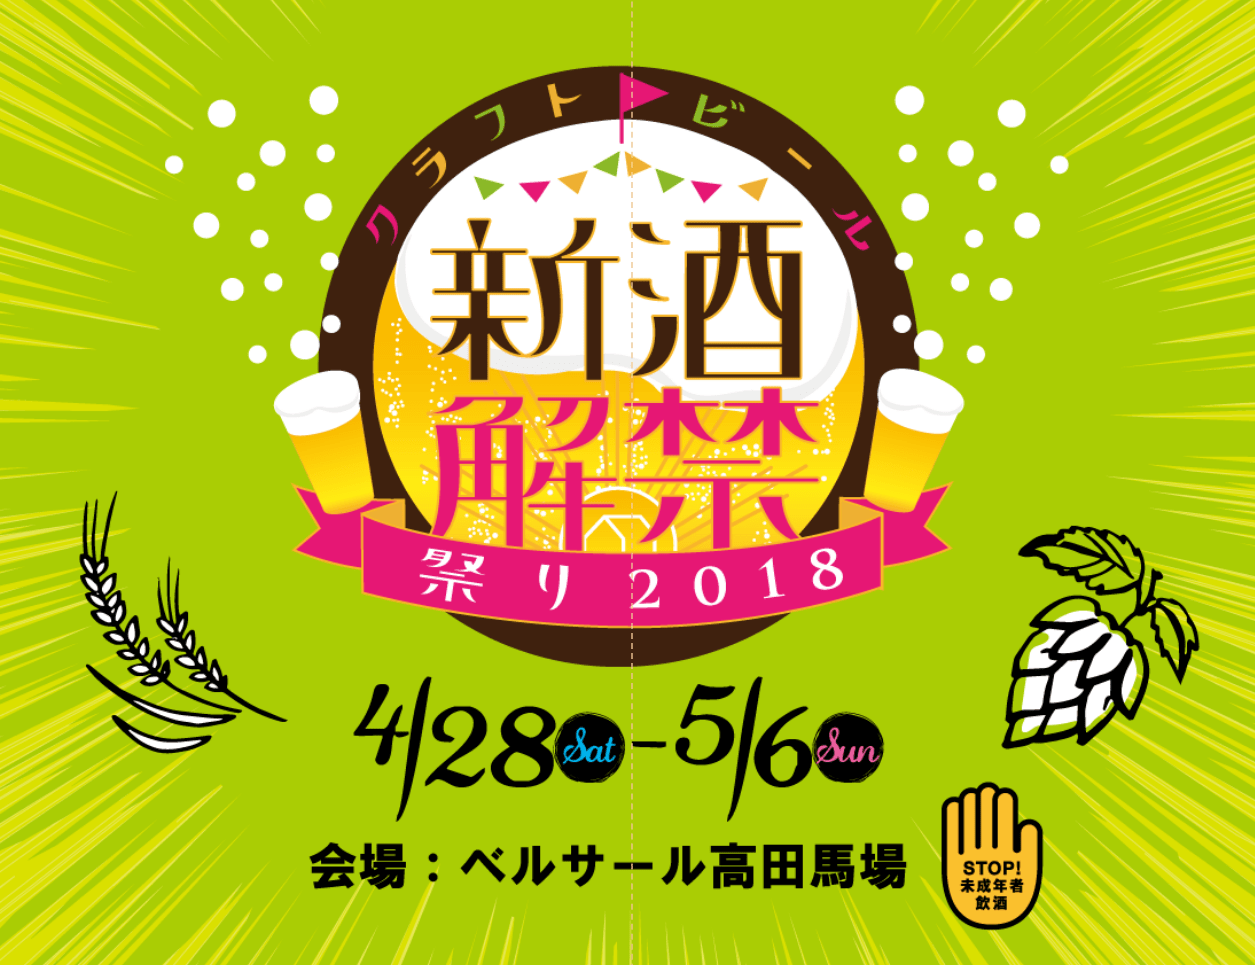 Craft Beer Shinshu 2018 クラフトビール新酒解禁祭り2018